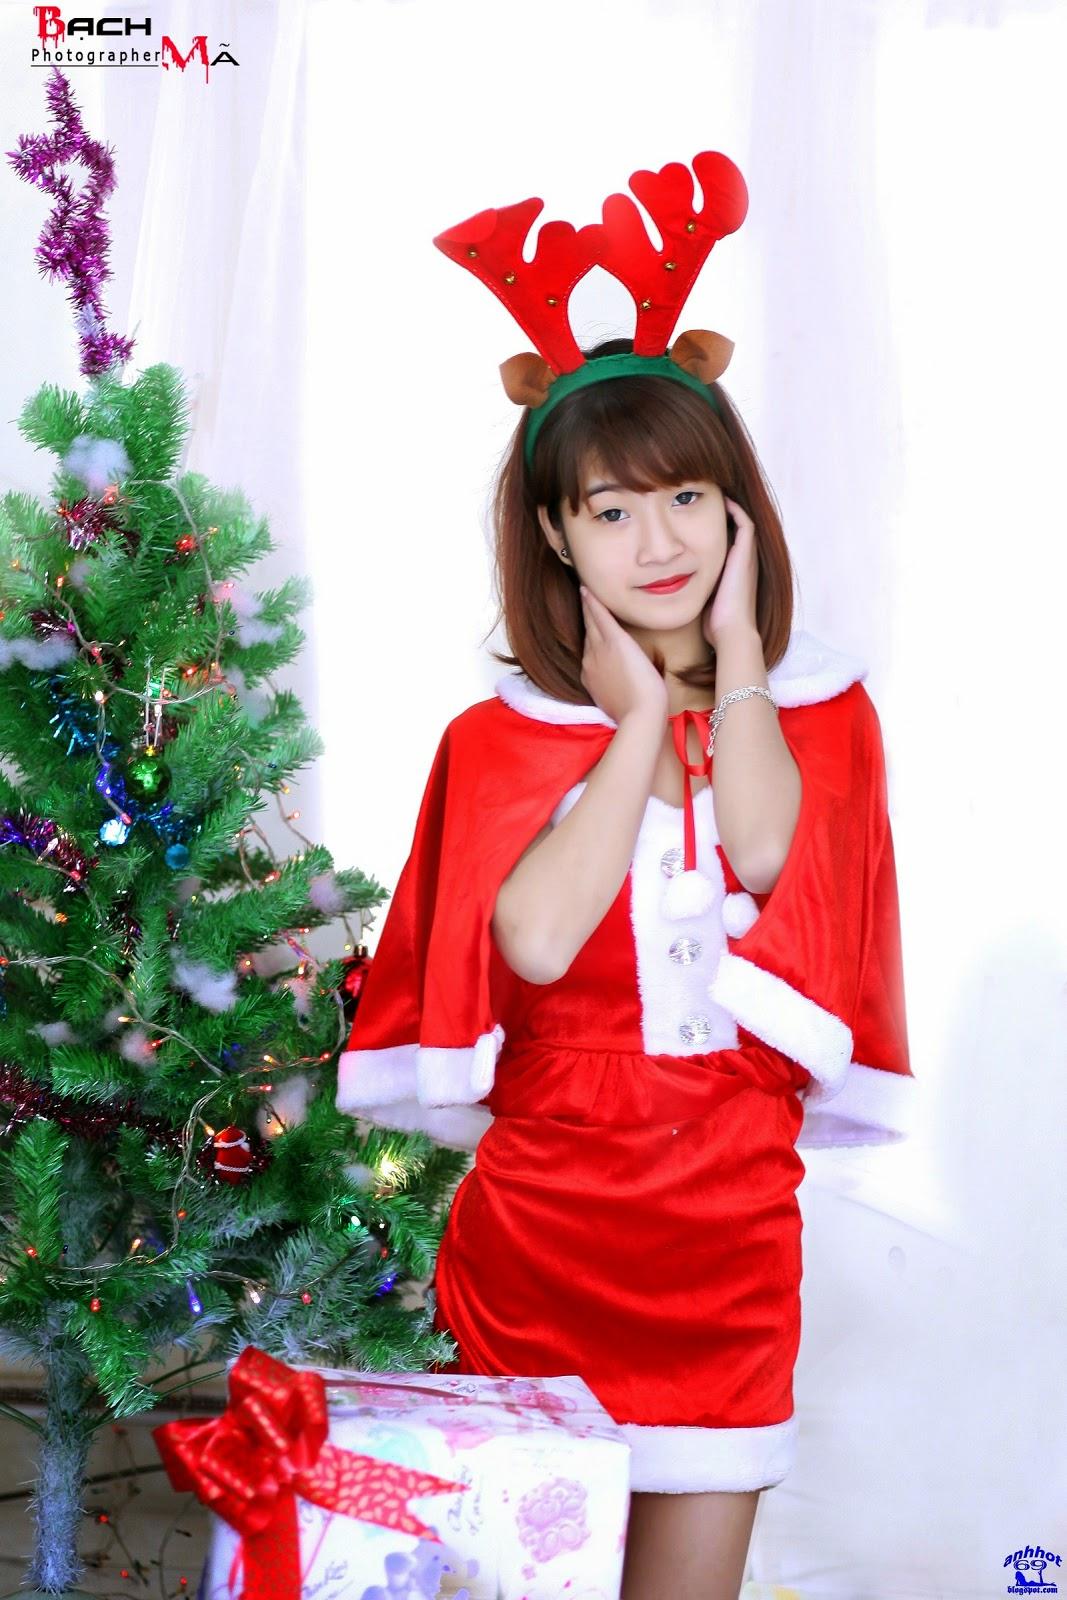 merry-christmas_1412251610_02